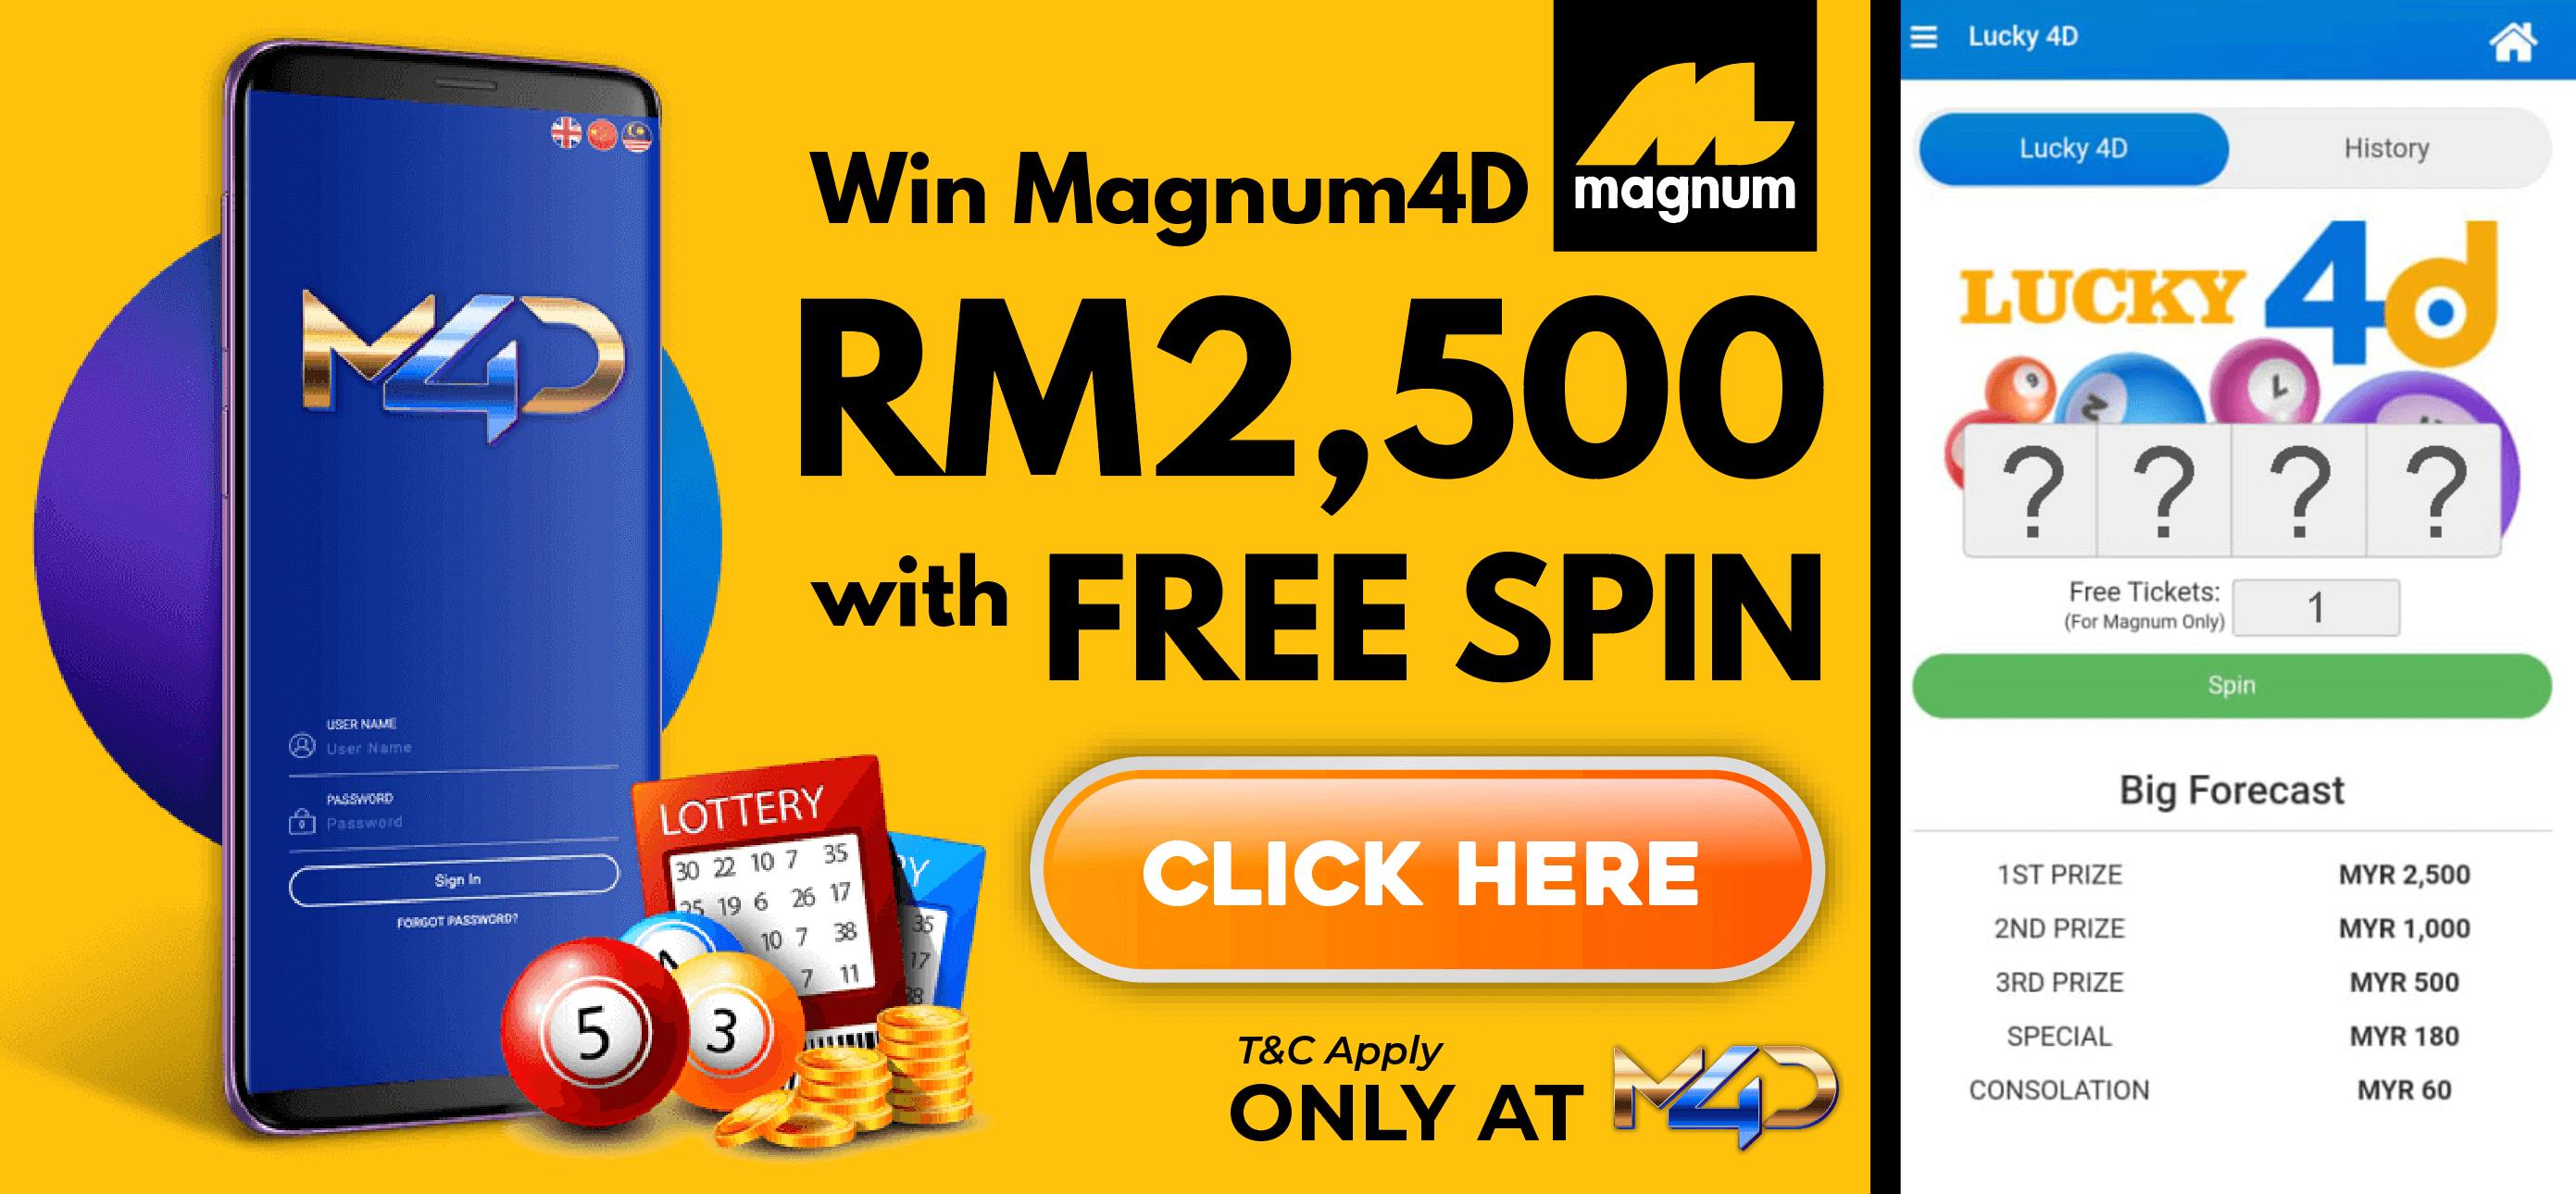 Magnum 4d free credit